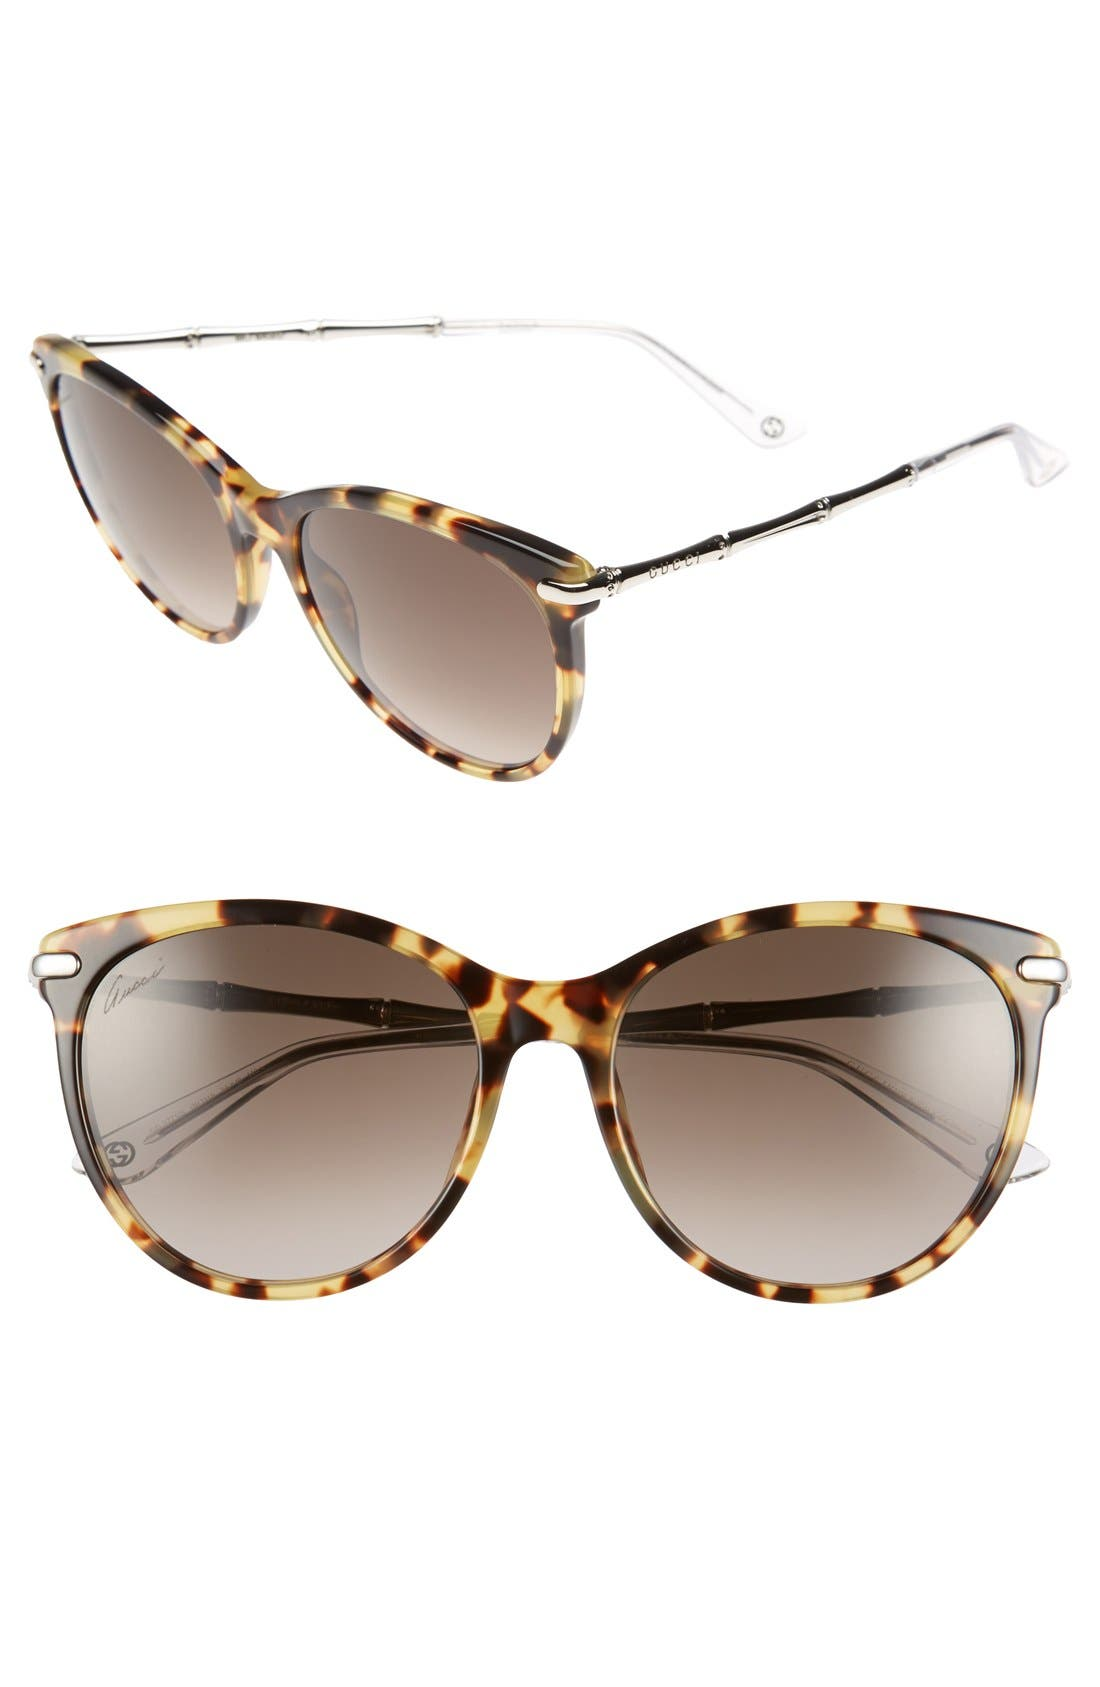 Main Image - Gucci 60mm Cat Eye Sunglasses